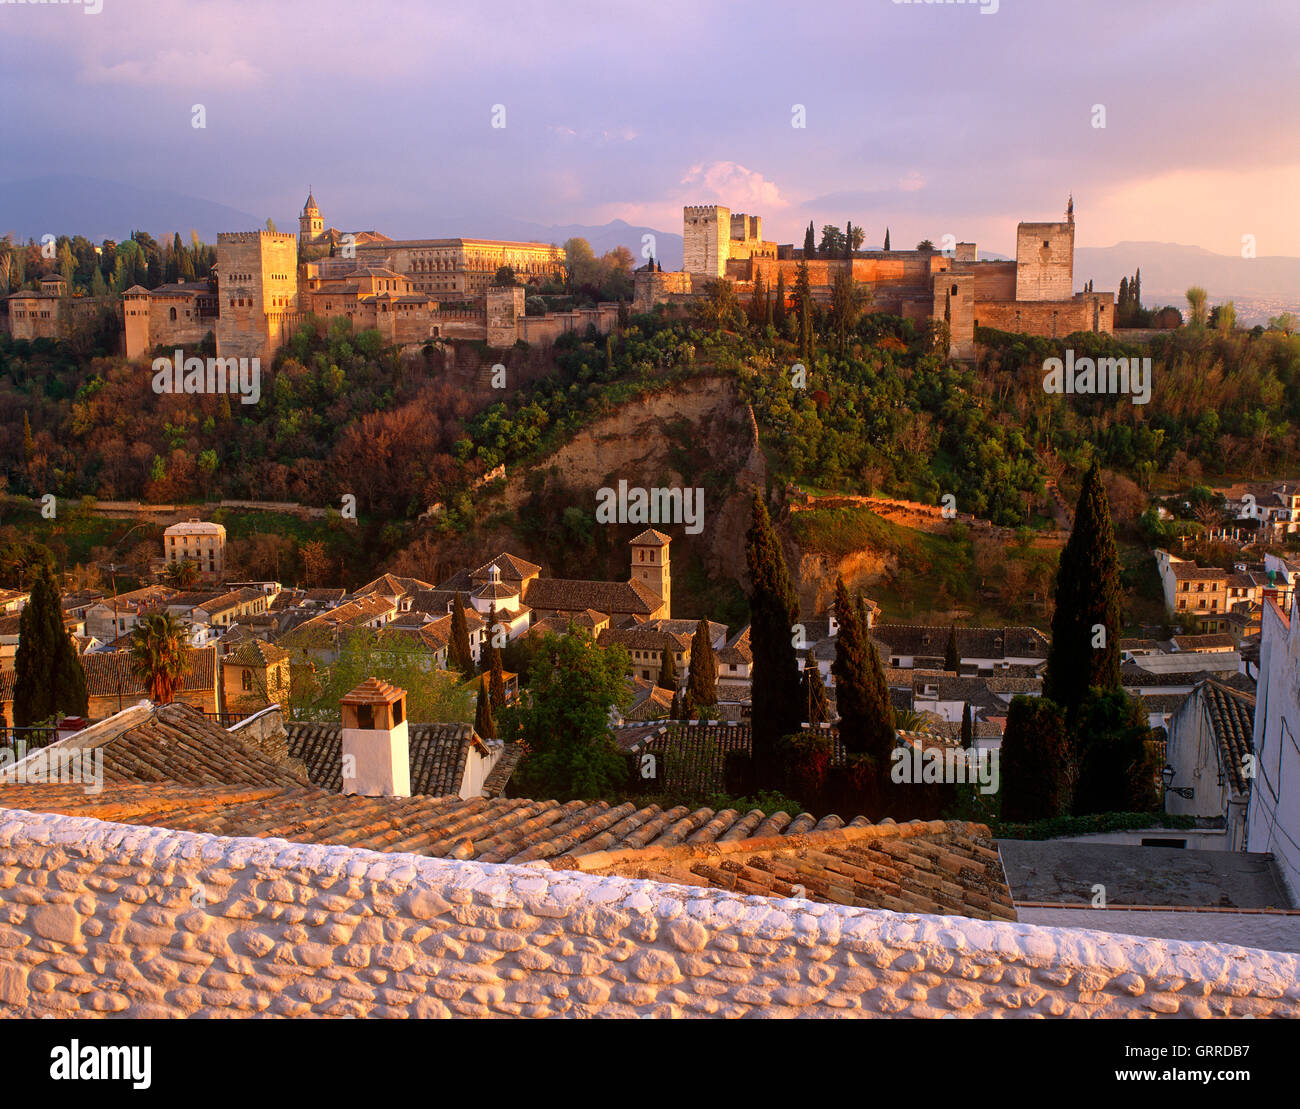 Alhambra-Palast bei Sonnenuntergang, Granada, Andalusien, Spanien Stockbild